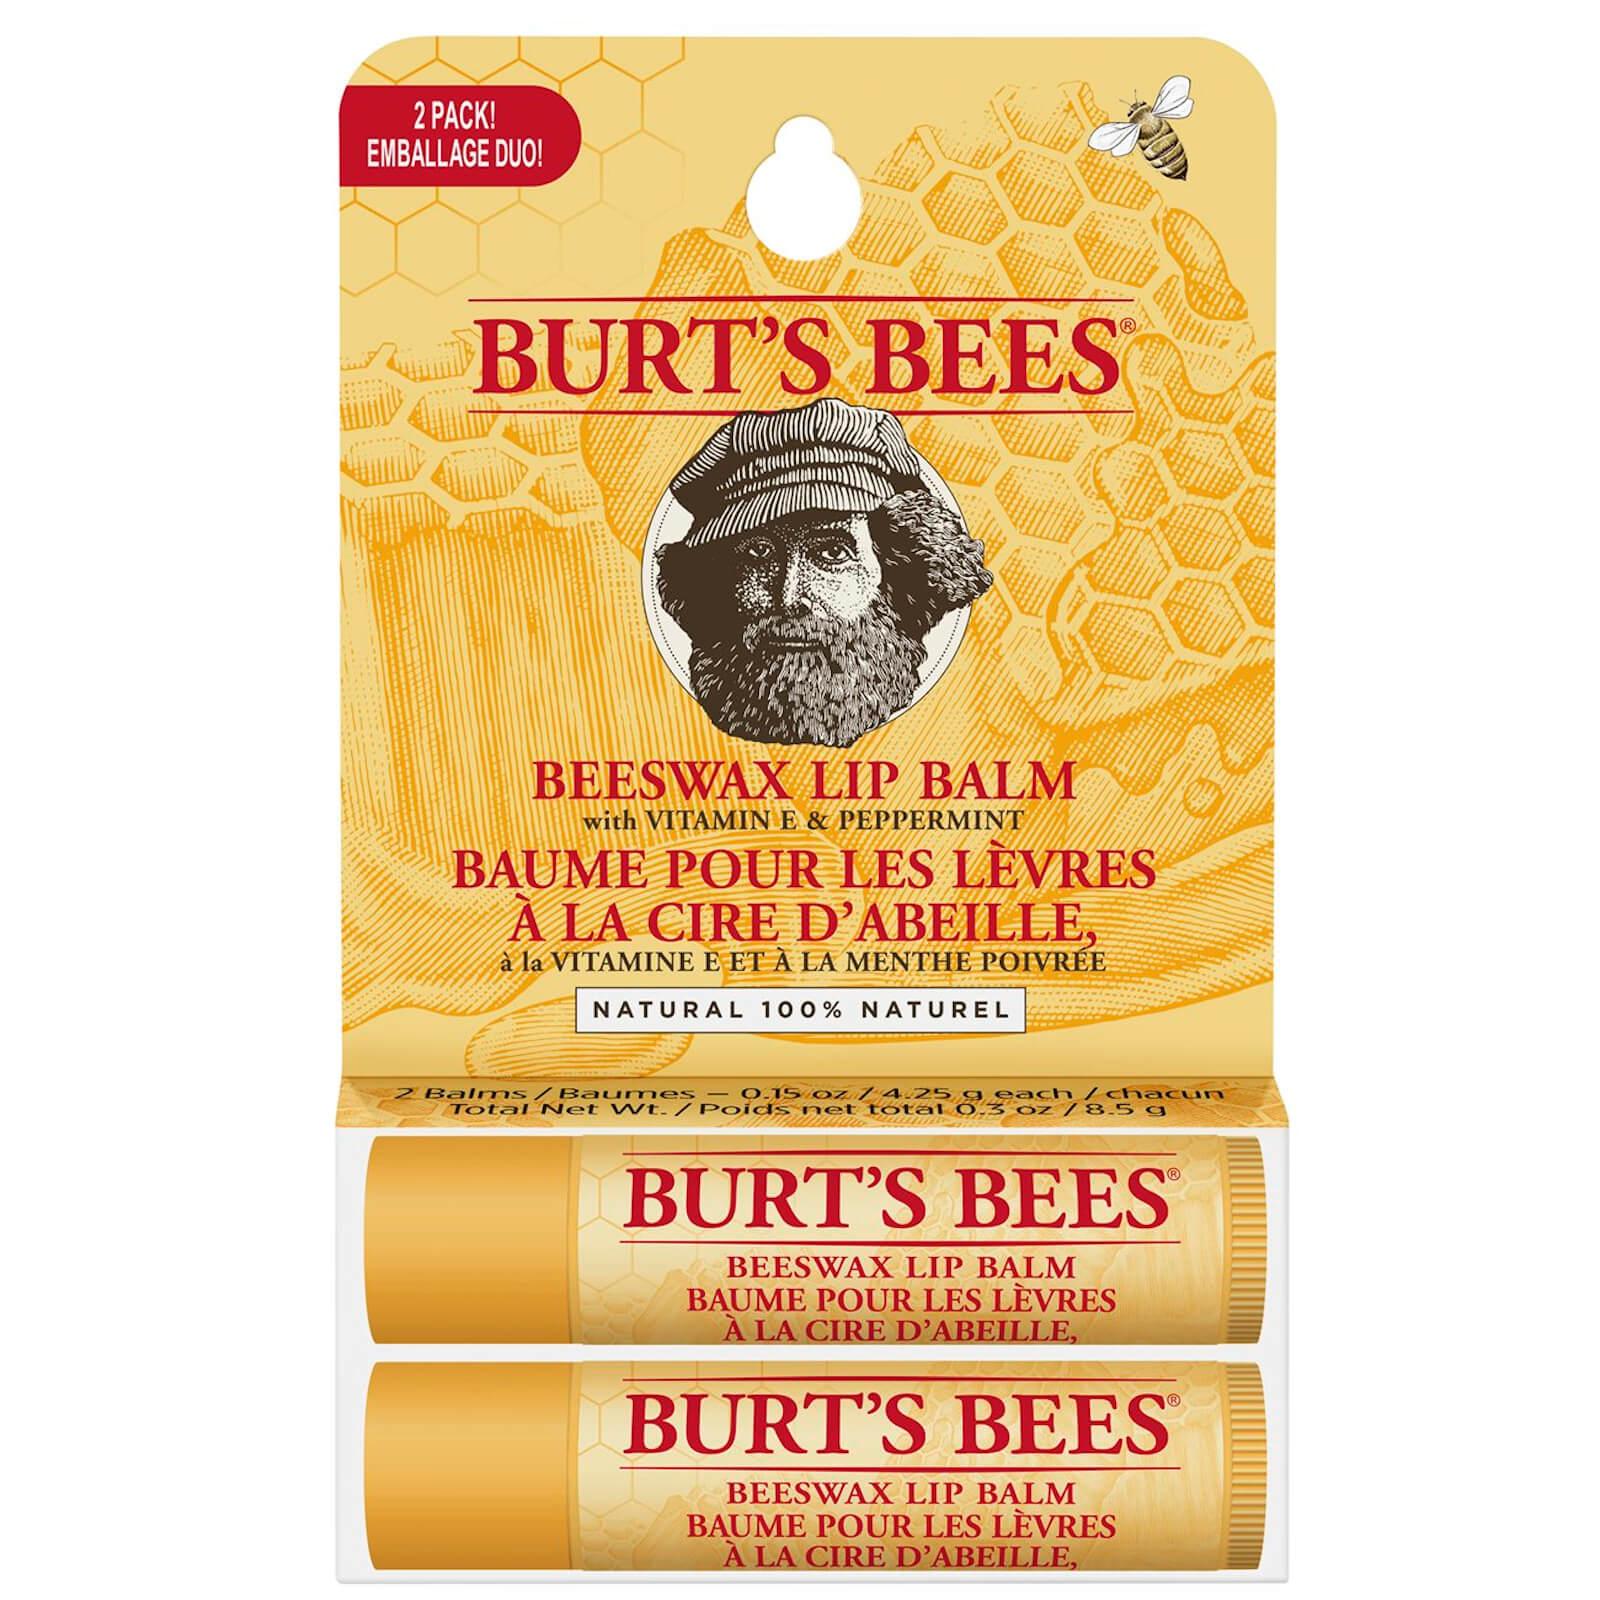 Beeswax Lip Balm 2 Pack